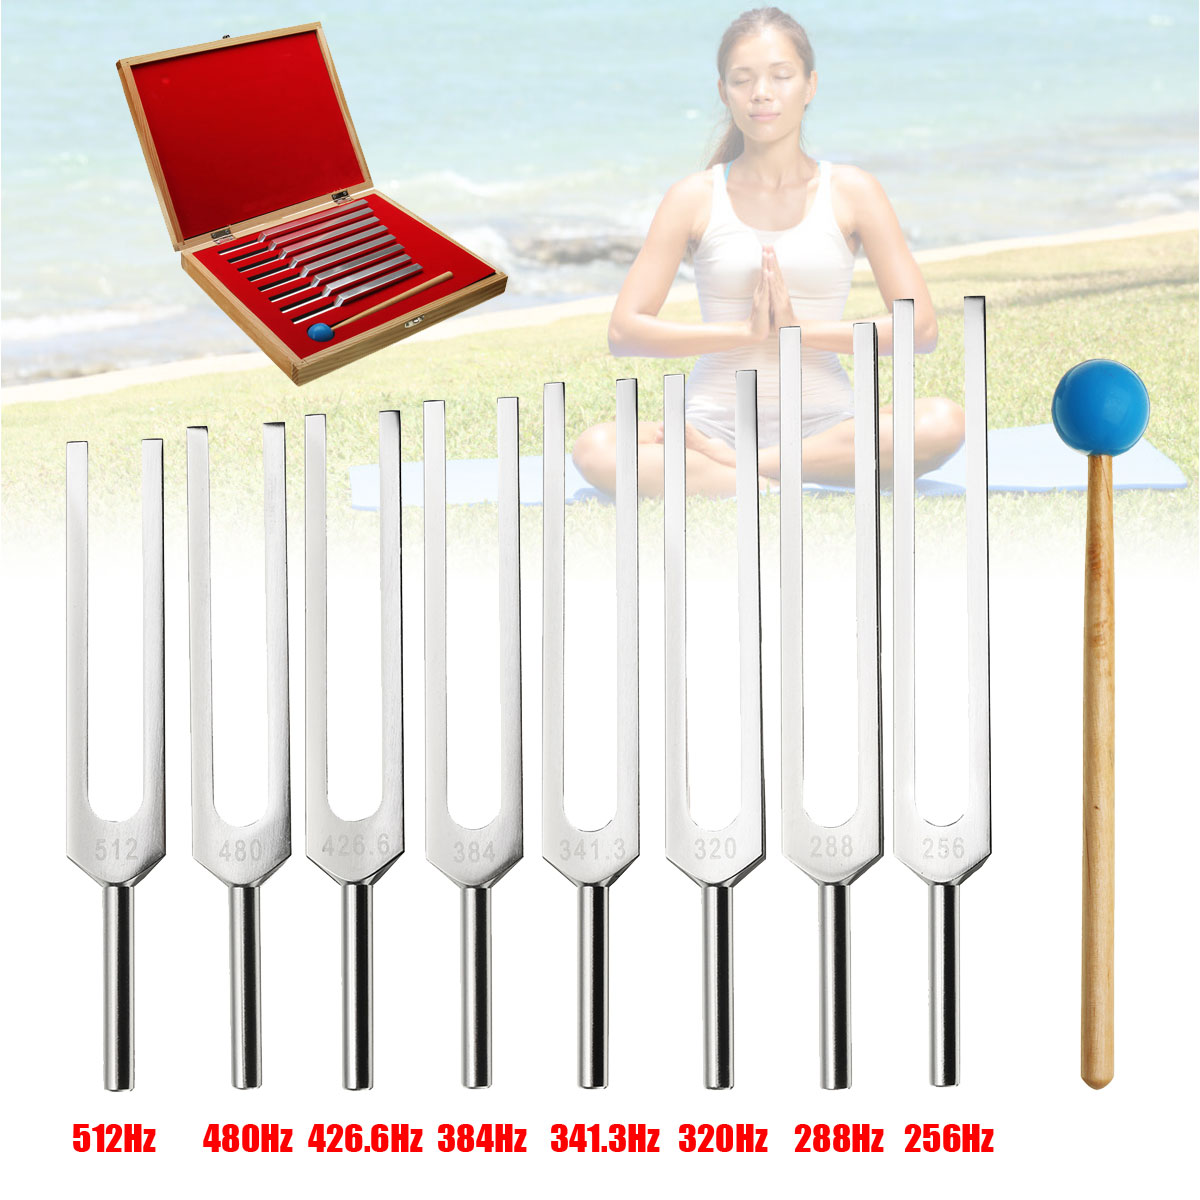 ZEAST 8Pcs Set Aluminum Medical Tuning Fork Healing Sound Vibration Therapy 256Hz 288Hz 320Hz 341Hz 384Hz